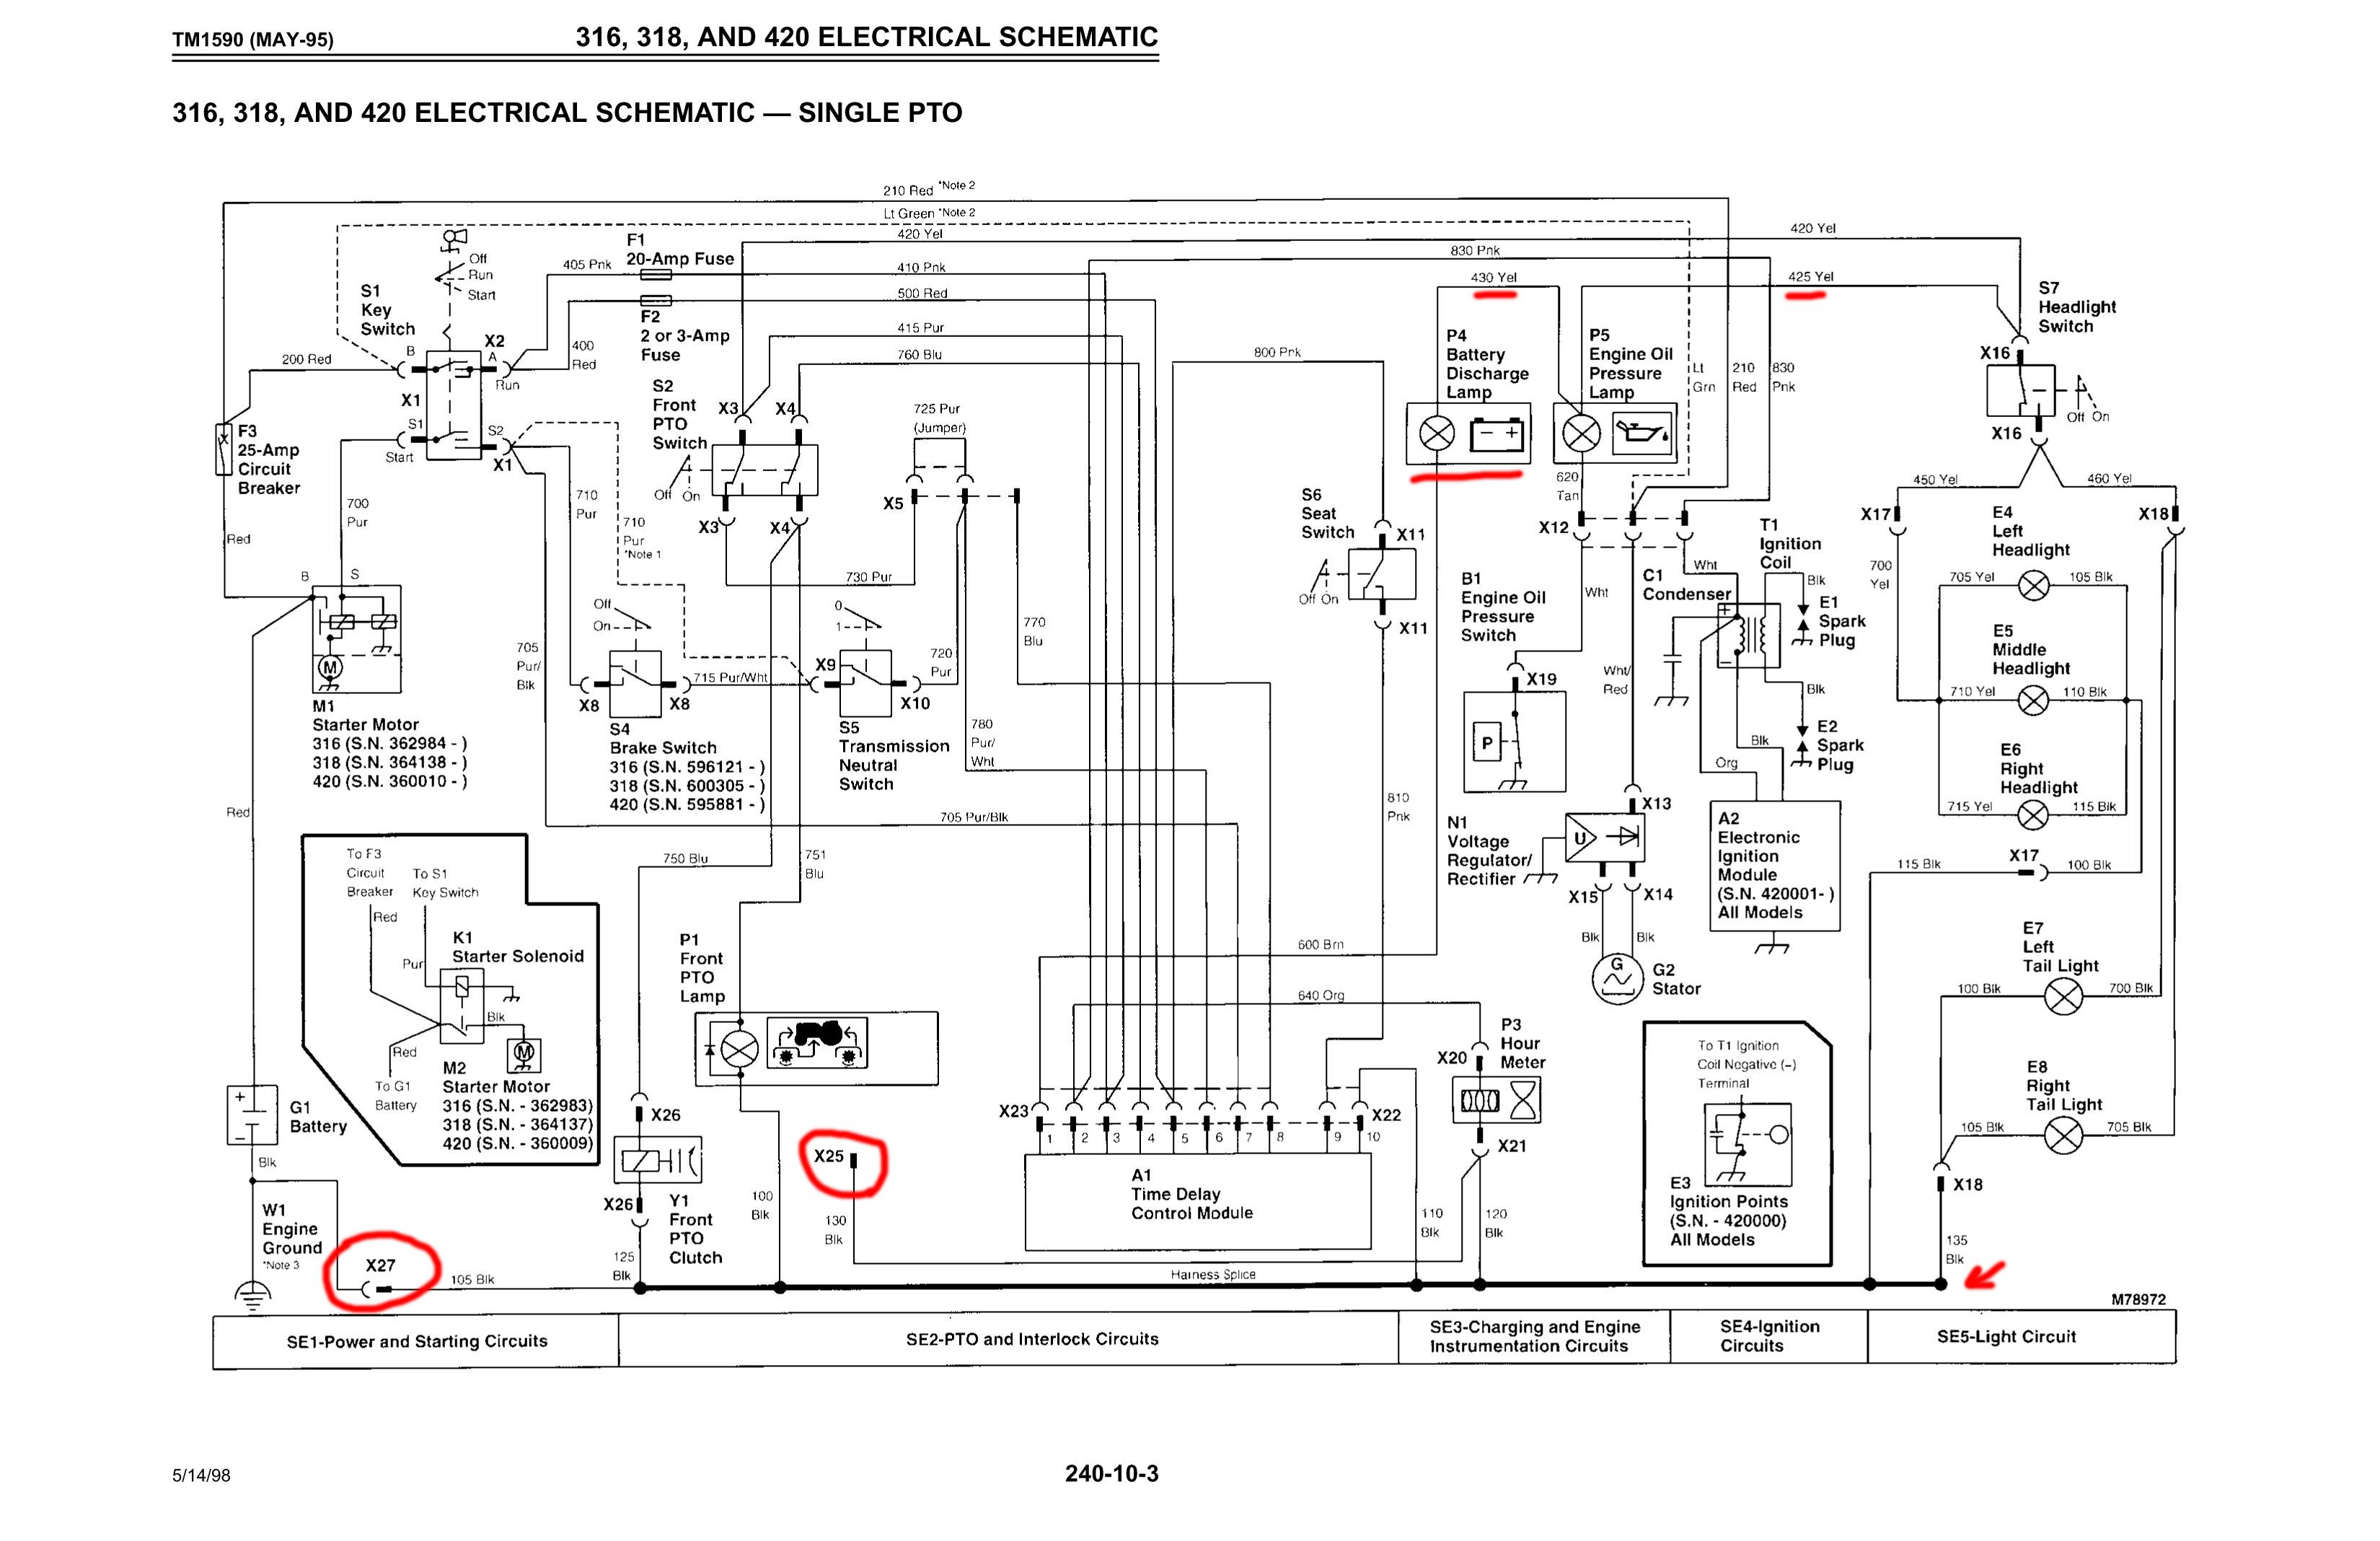 john deere 1050 wiring diagram wiring diagram bolens wiring diagrams image about diagram wiring diagram john deere